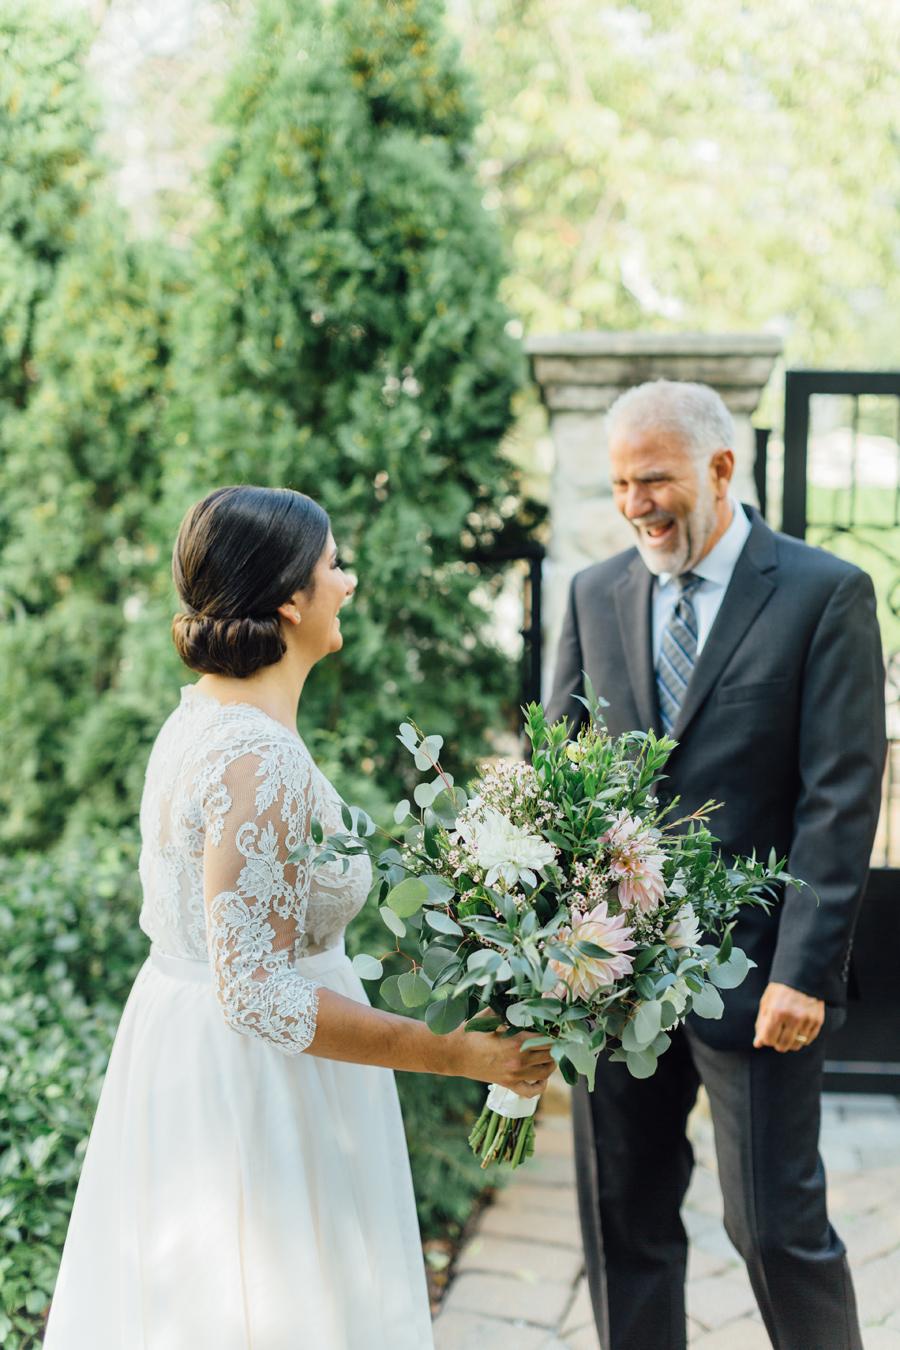 the-inn-at-leola-wedding-lancaster-pennsylvania-wedding-photographer-rebeka-viola-photograhy (21).jpg